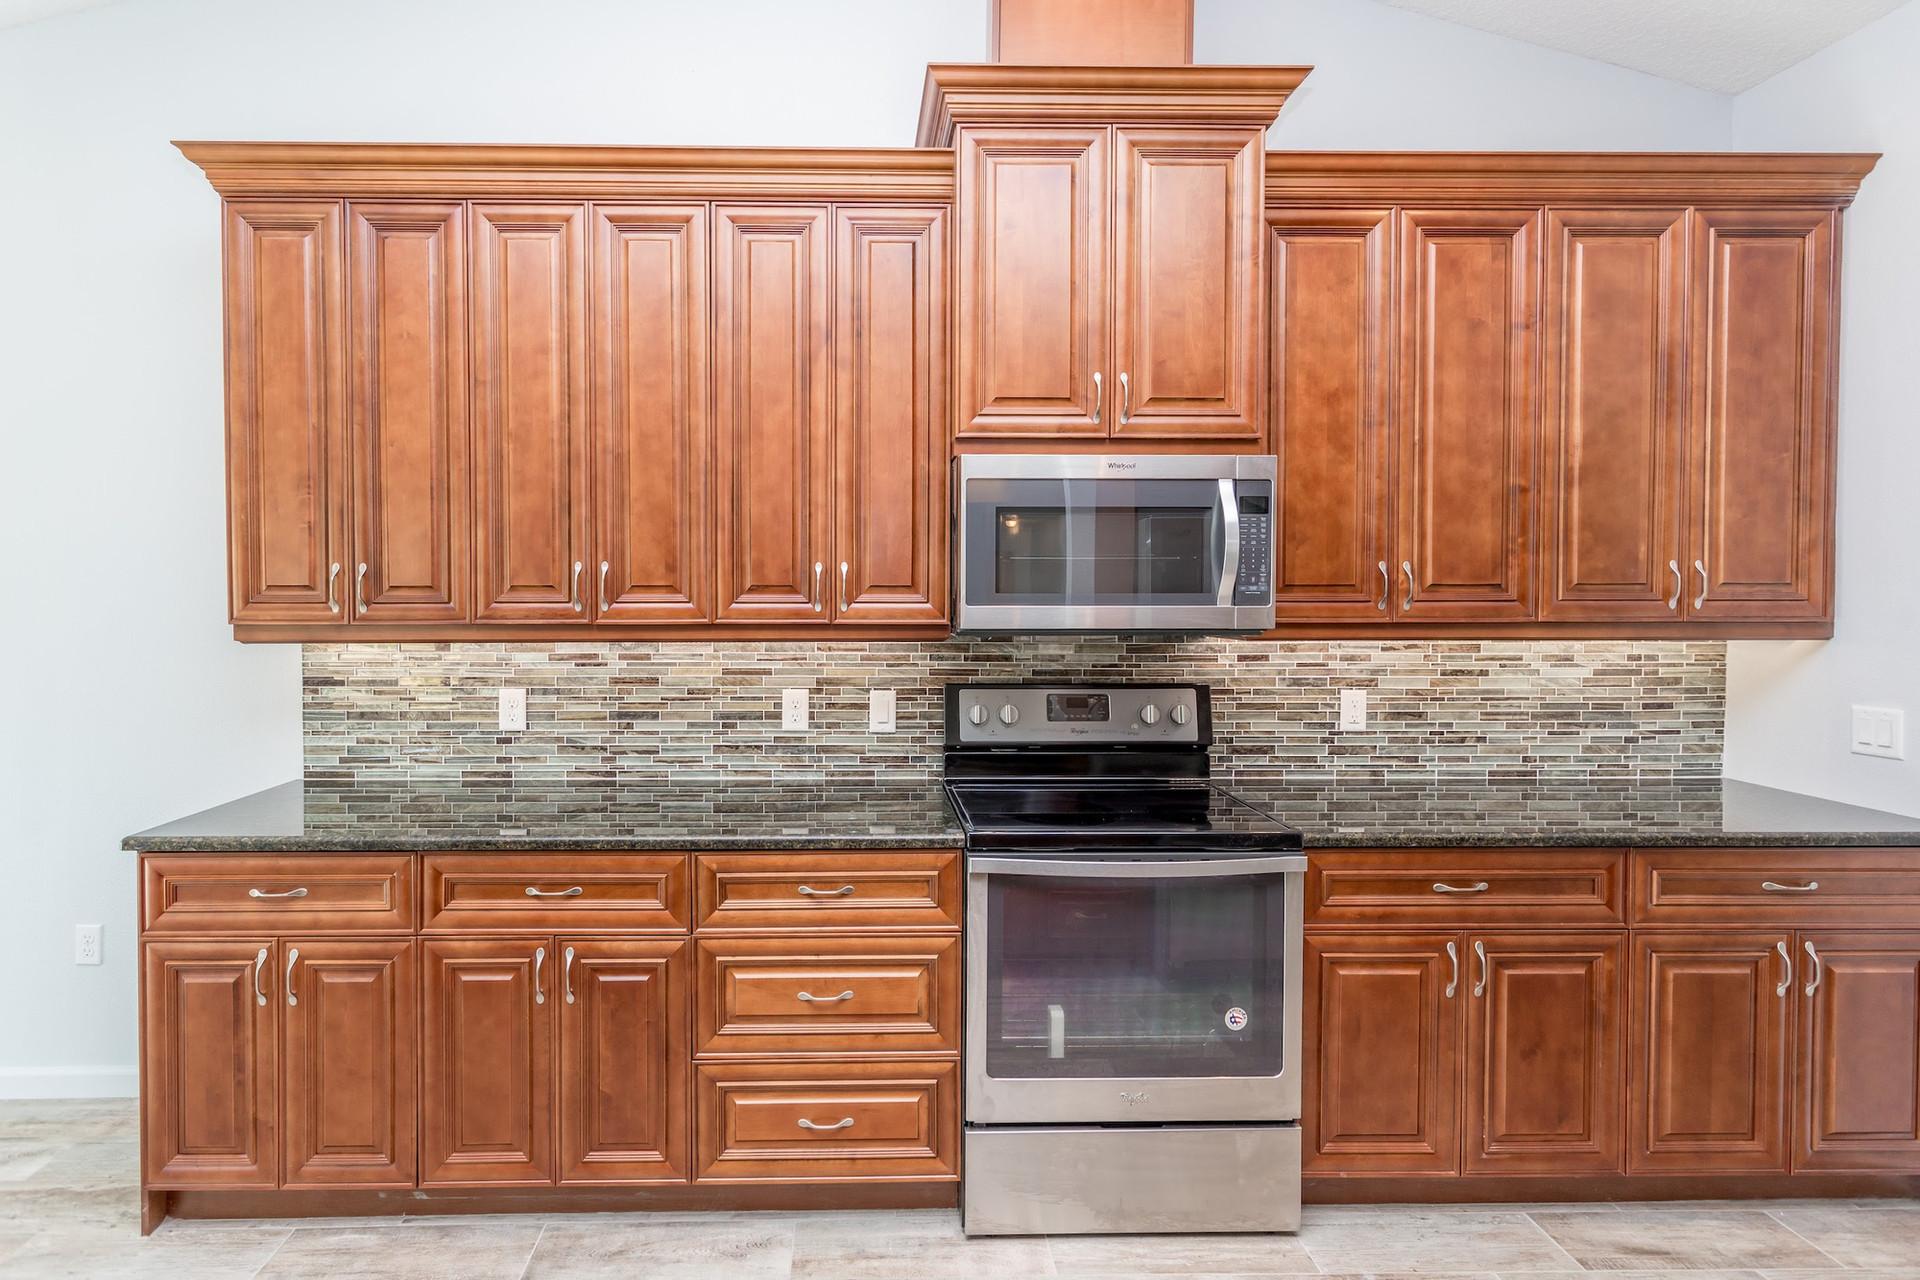 LEDGESTONE kitchen granite counter and wood cabinets